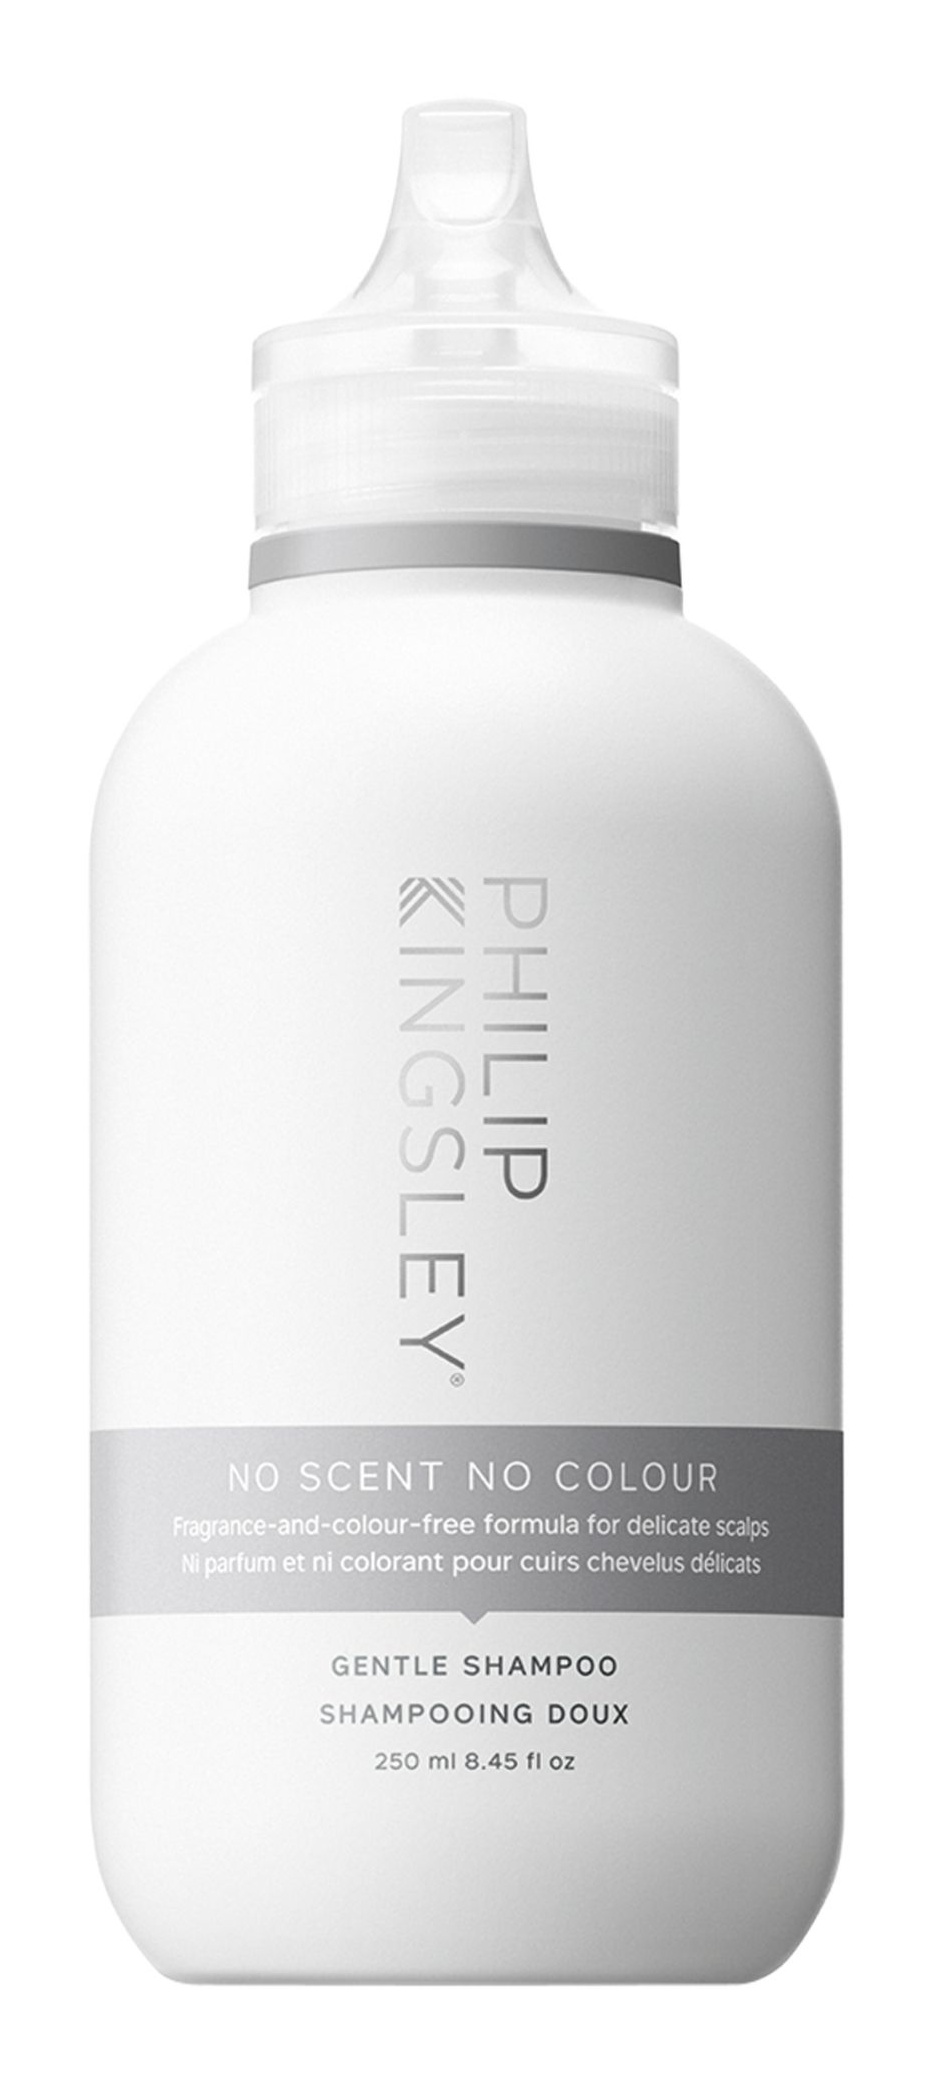 Philip Kingsley No Scent No Colour Gentle Shampoo